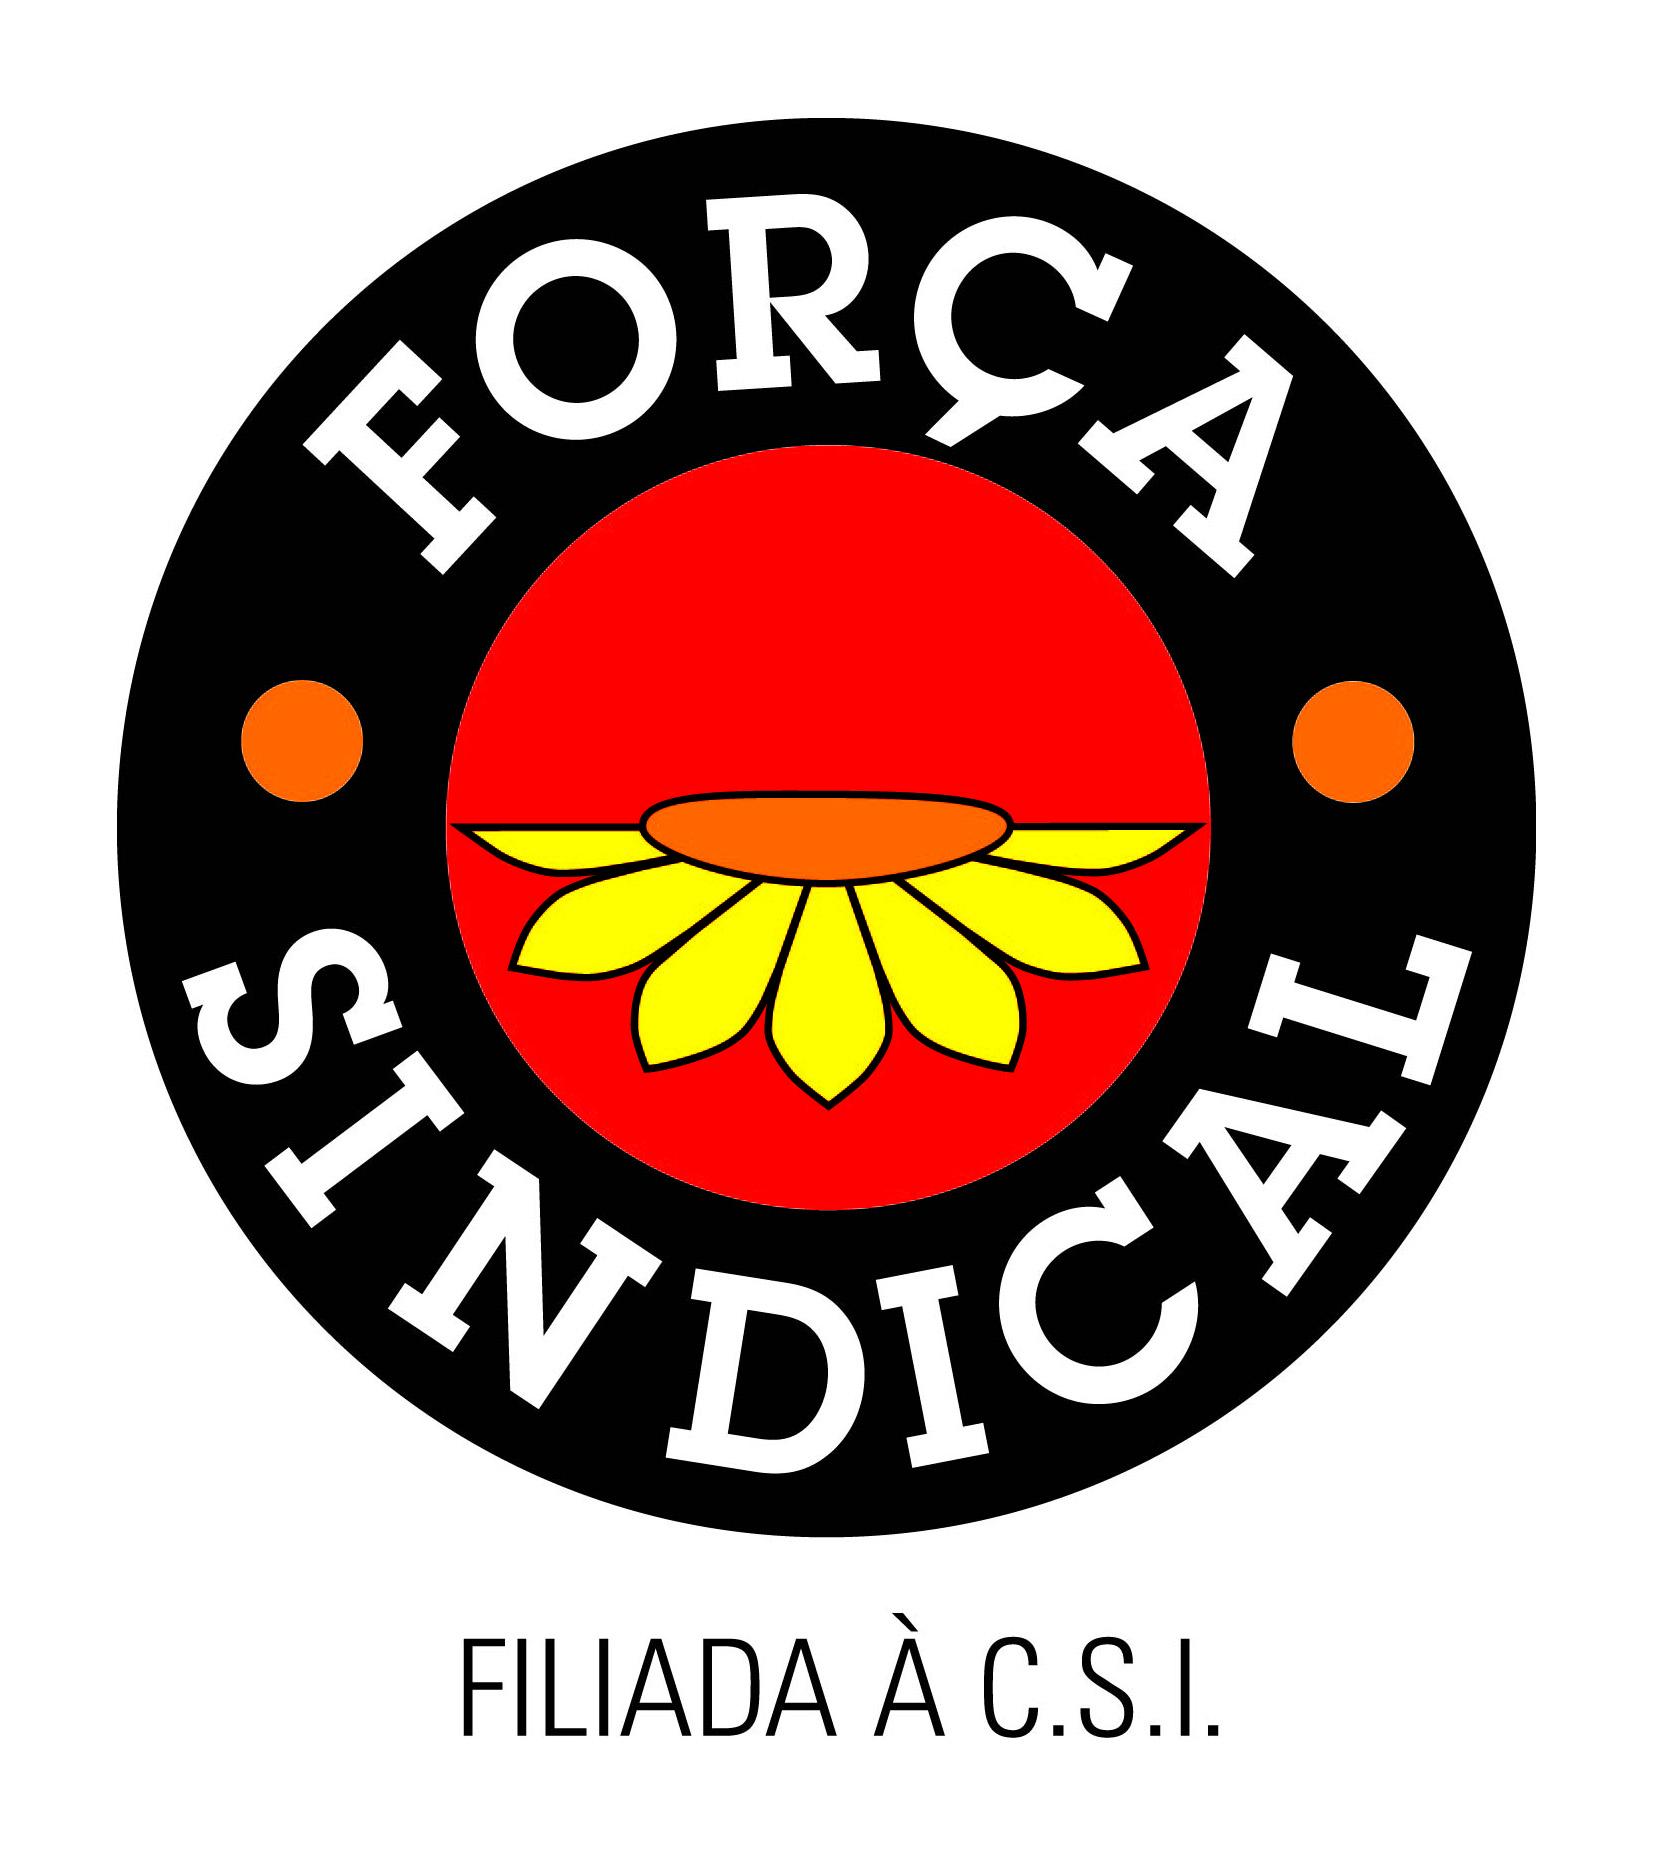 Logotipos da Força Sindical | Força Sindical